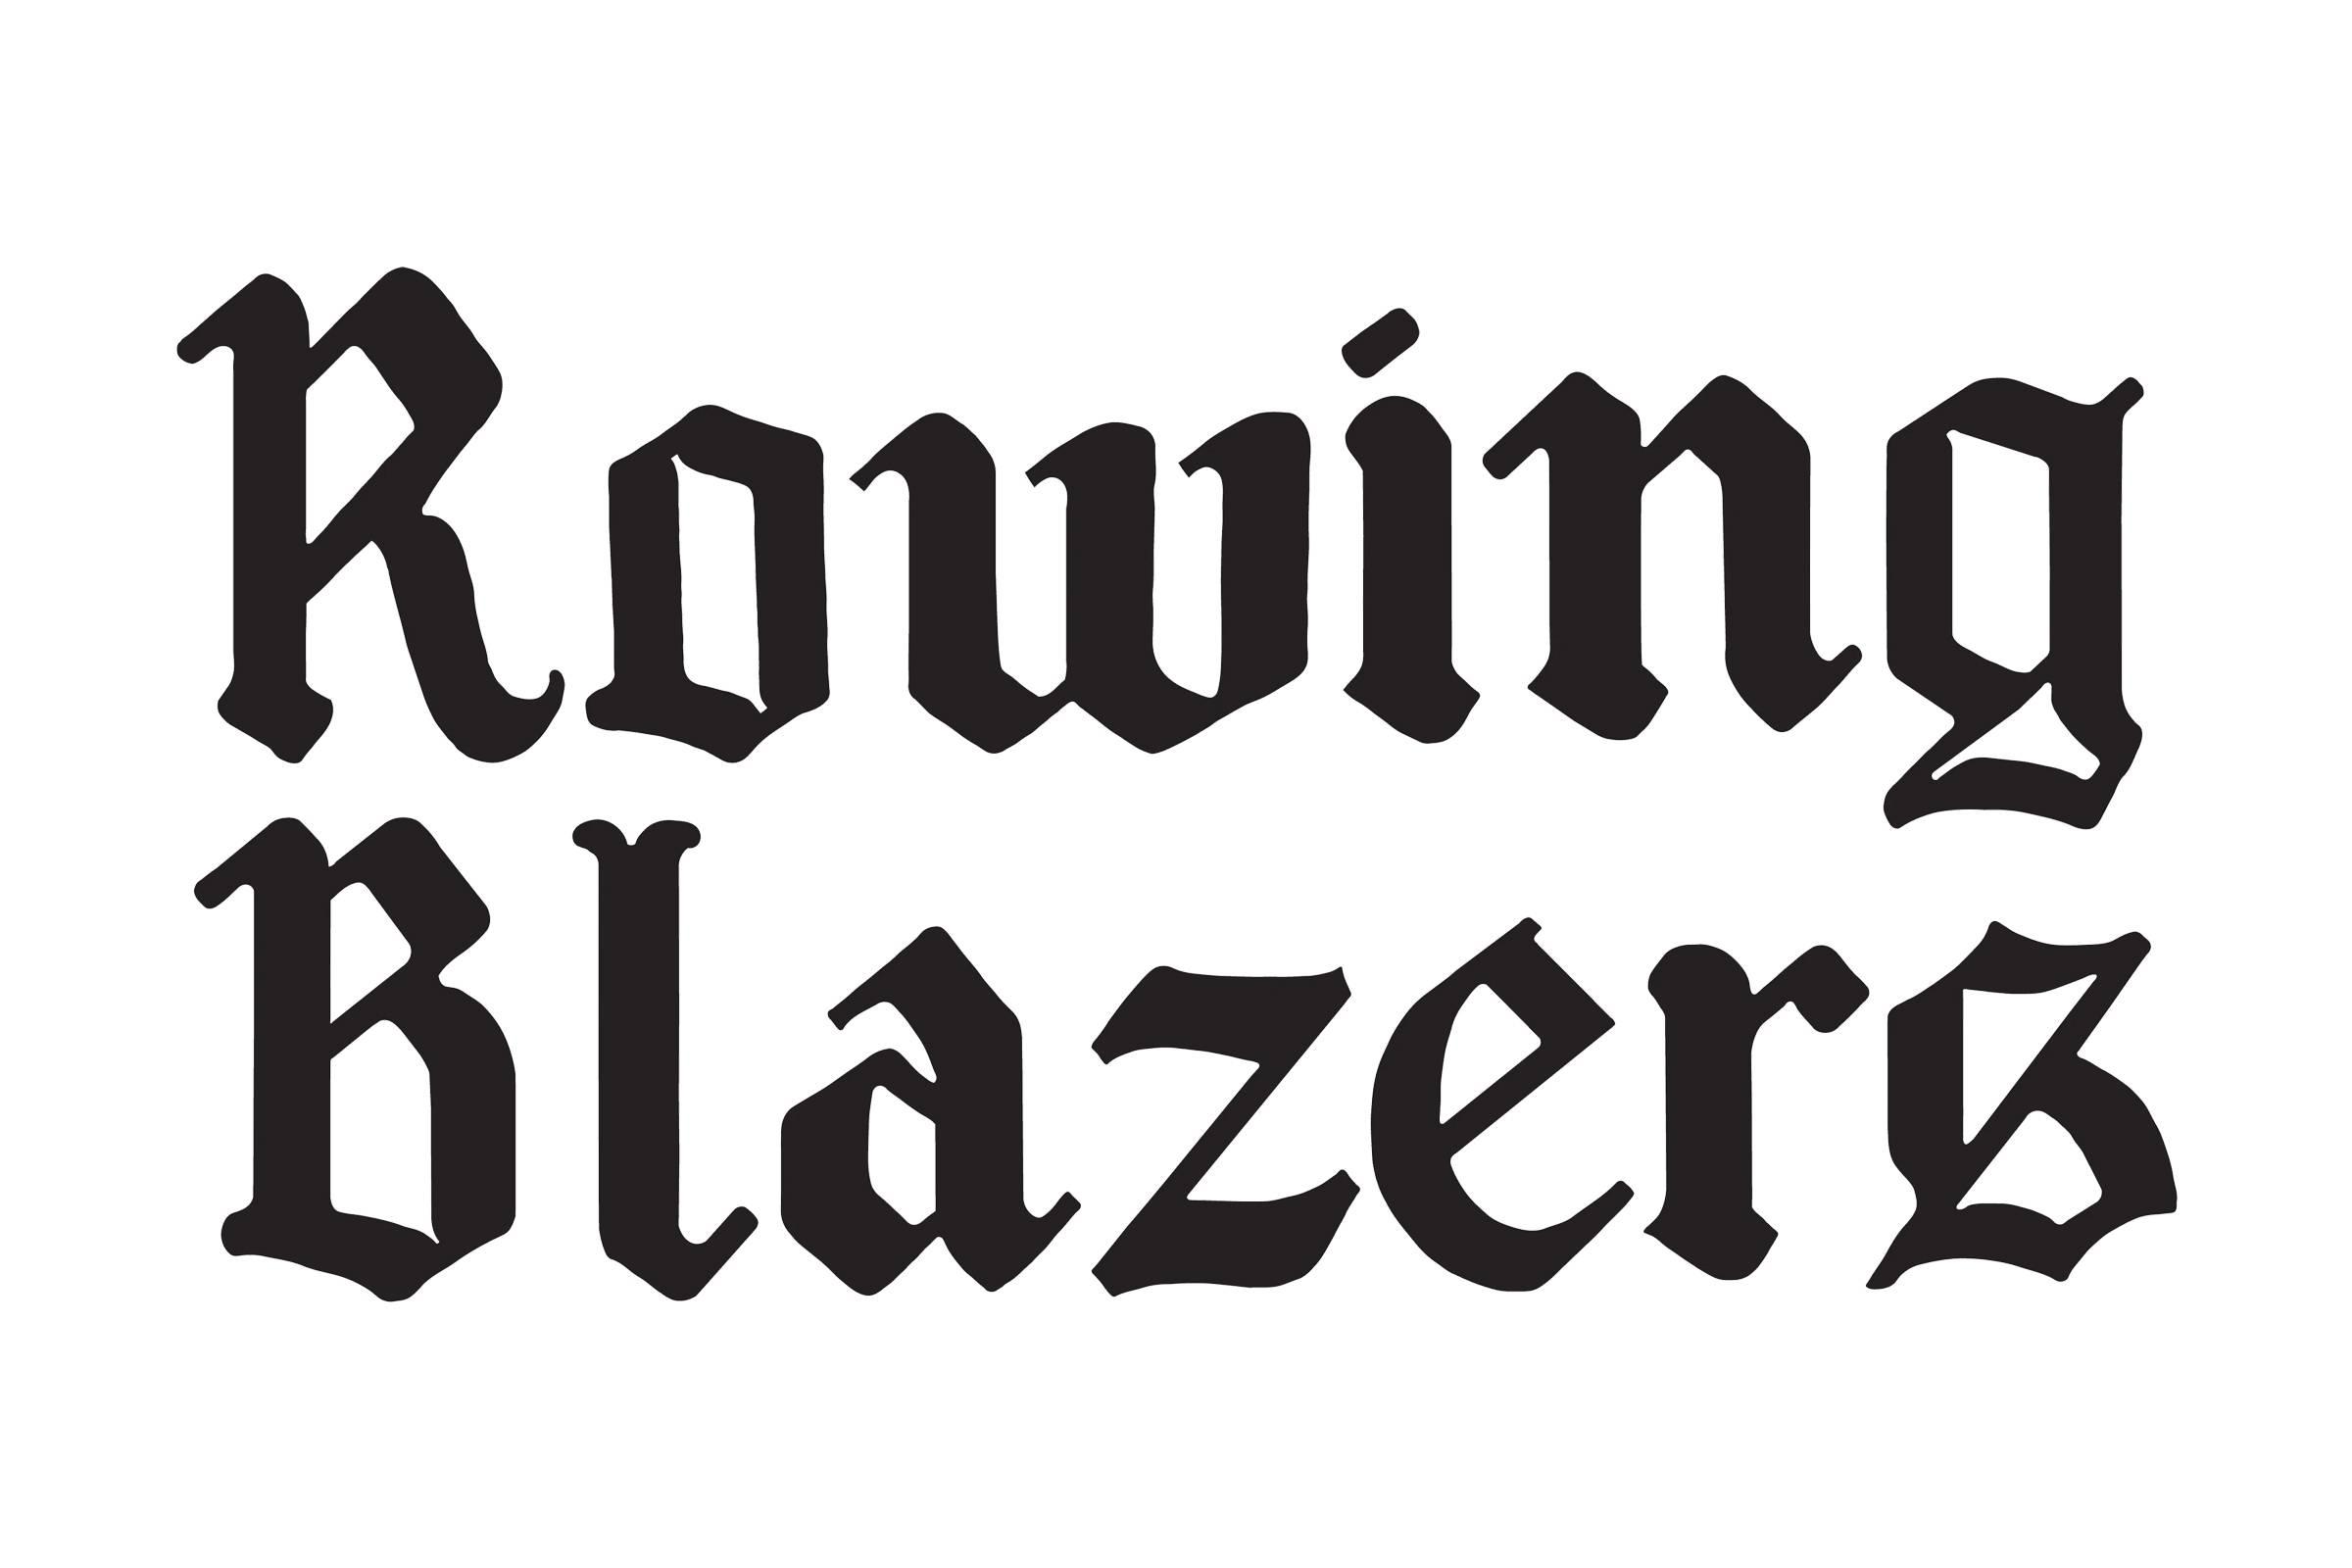 Preppy Clothing Brands: Rowing Blazers